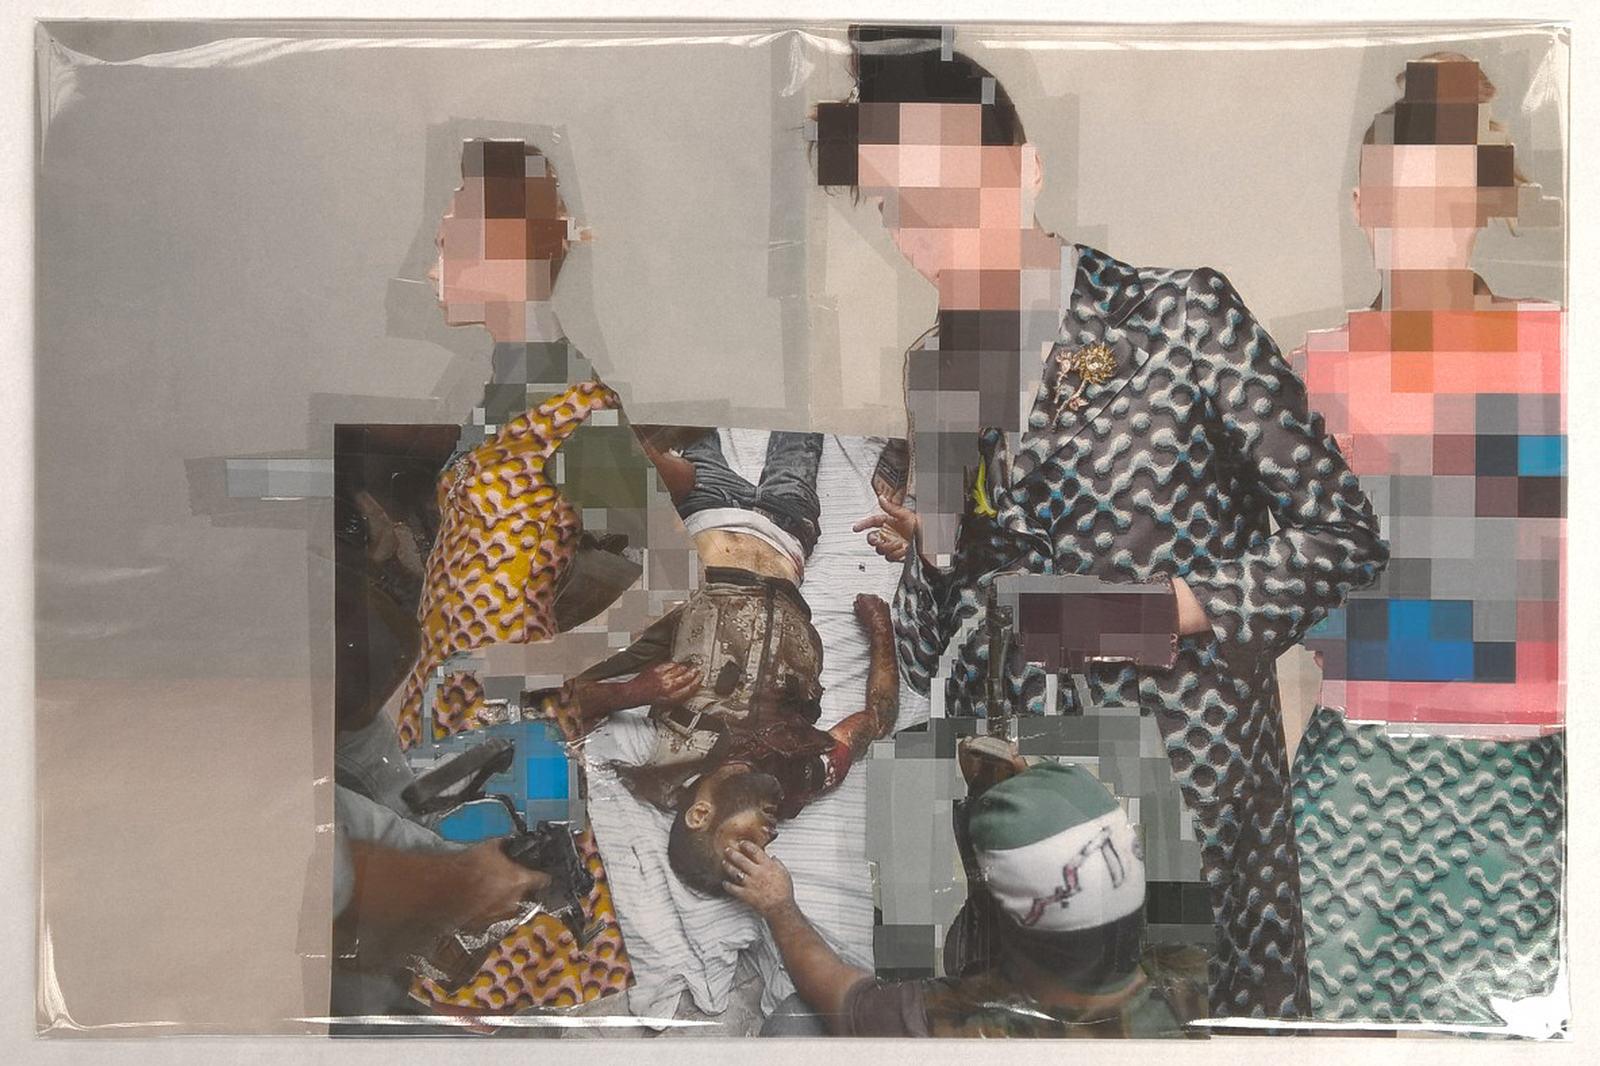 Pixel-Collage nº63, 2016, Prints, tape, transparent sheet, 33x50,5 cm